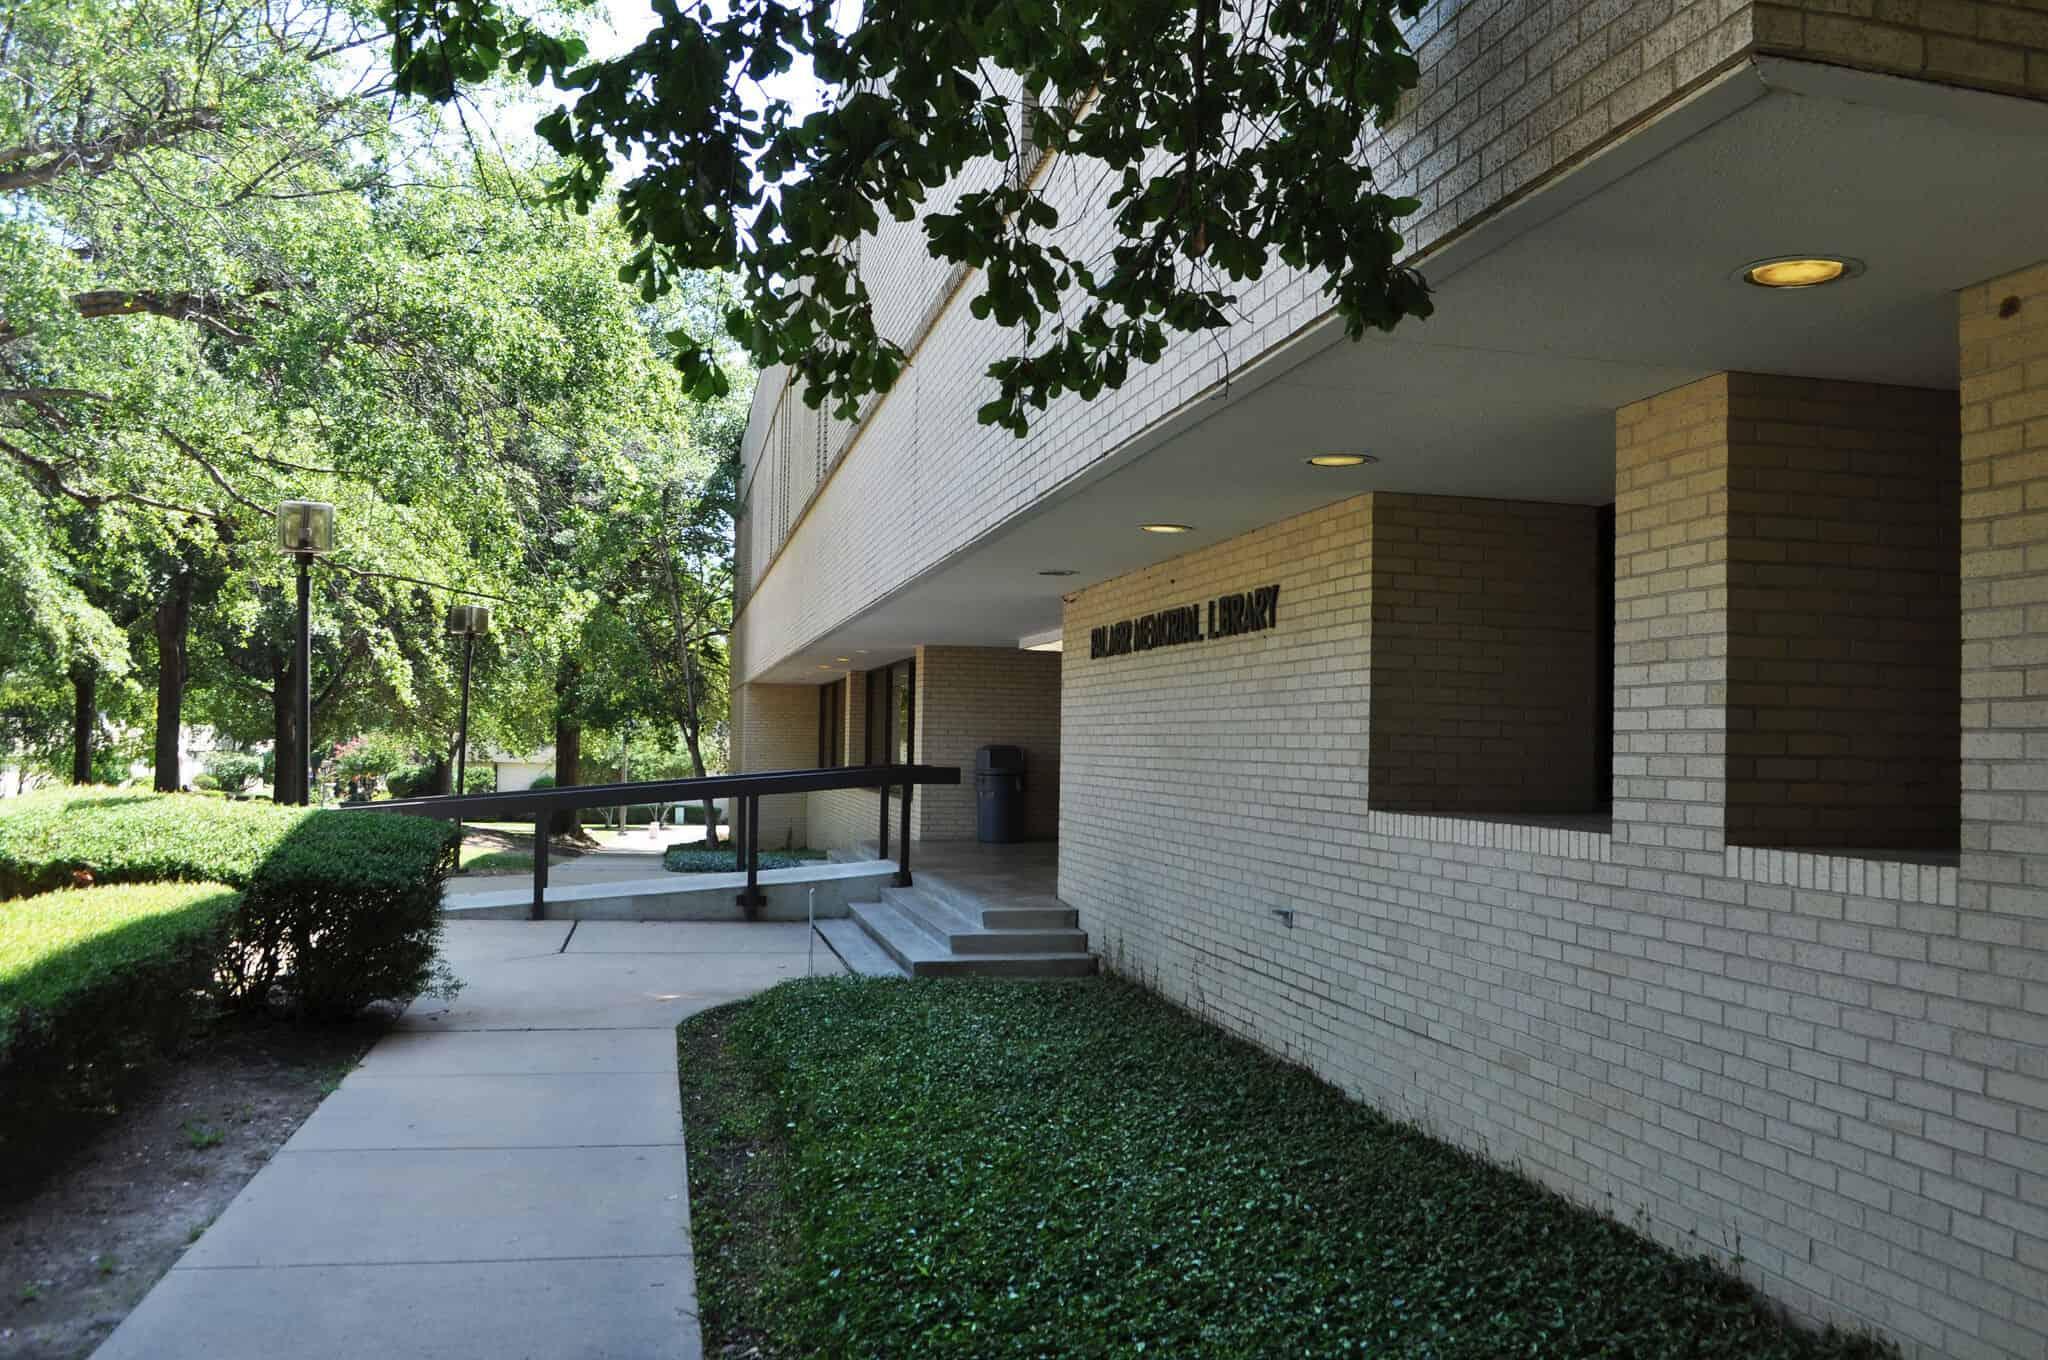 Celebrate National Library Week at Palmer Memorial Library